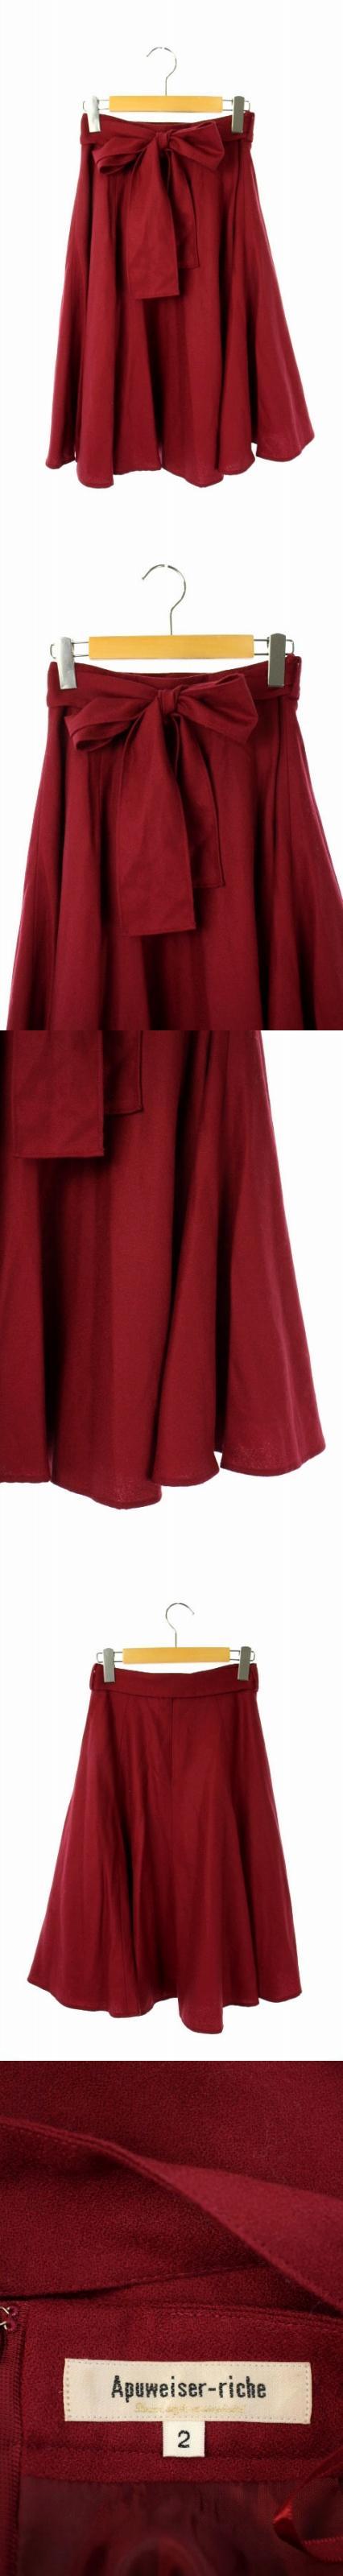 16AW スカート ロング フレア リボン 2 赤 /AO ■OS